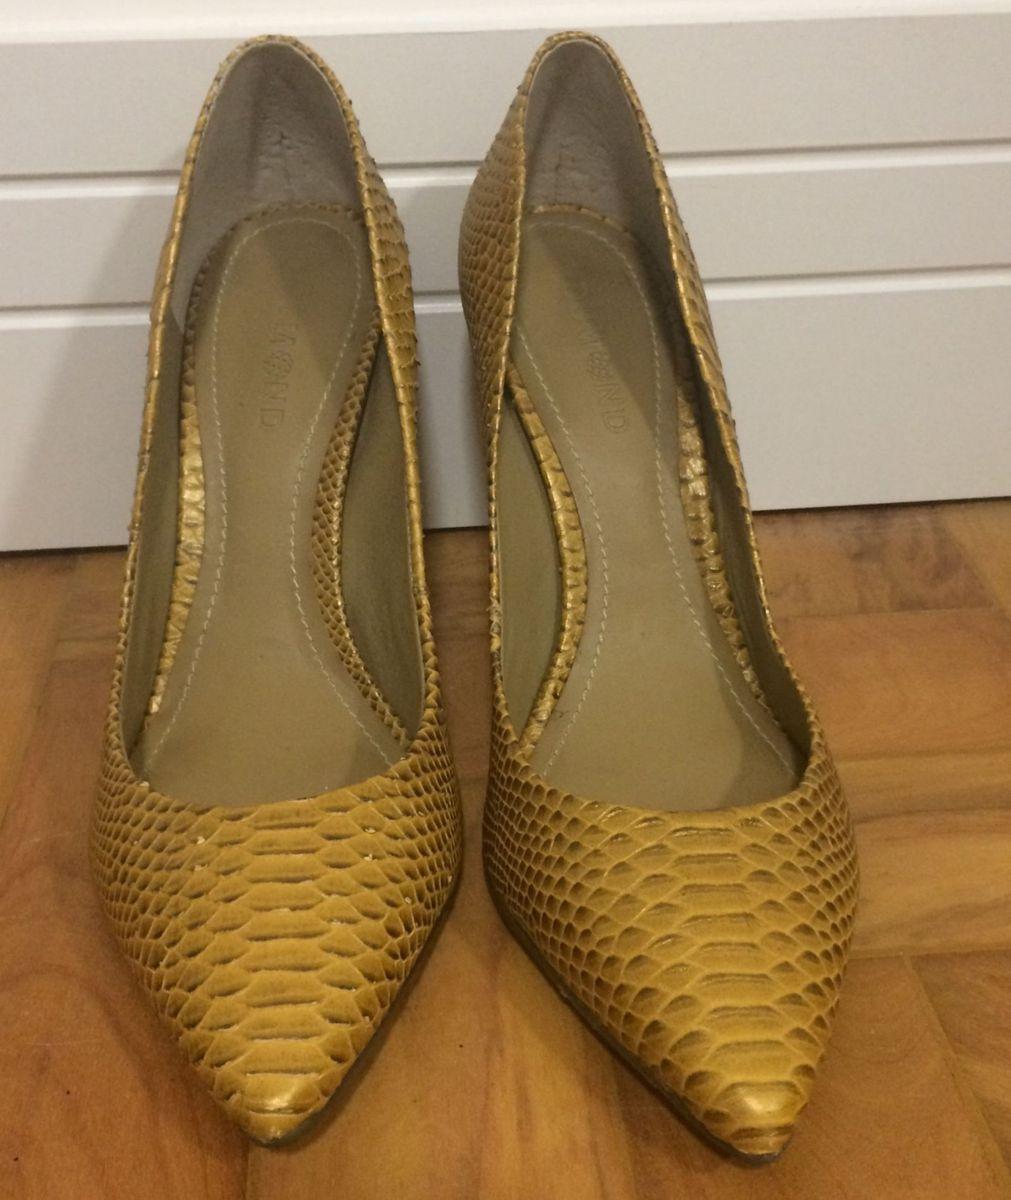 11211aea3 scarpin dumond amarelo - sapatos dumond.  Czm6ly9wag90b3muzw5qb2vplmnvbs5ici9wcm9kdwn0cy84mzg5mjgvnjdjmmvin2u2mtviodbhodi3ztiwnzvjngy0mmi1mdmuanbn